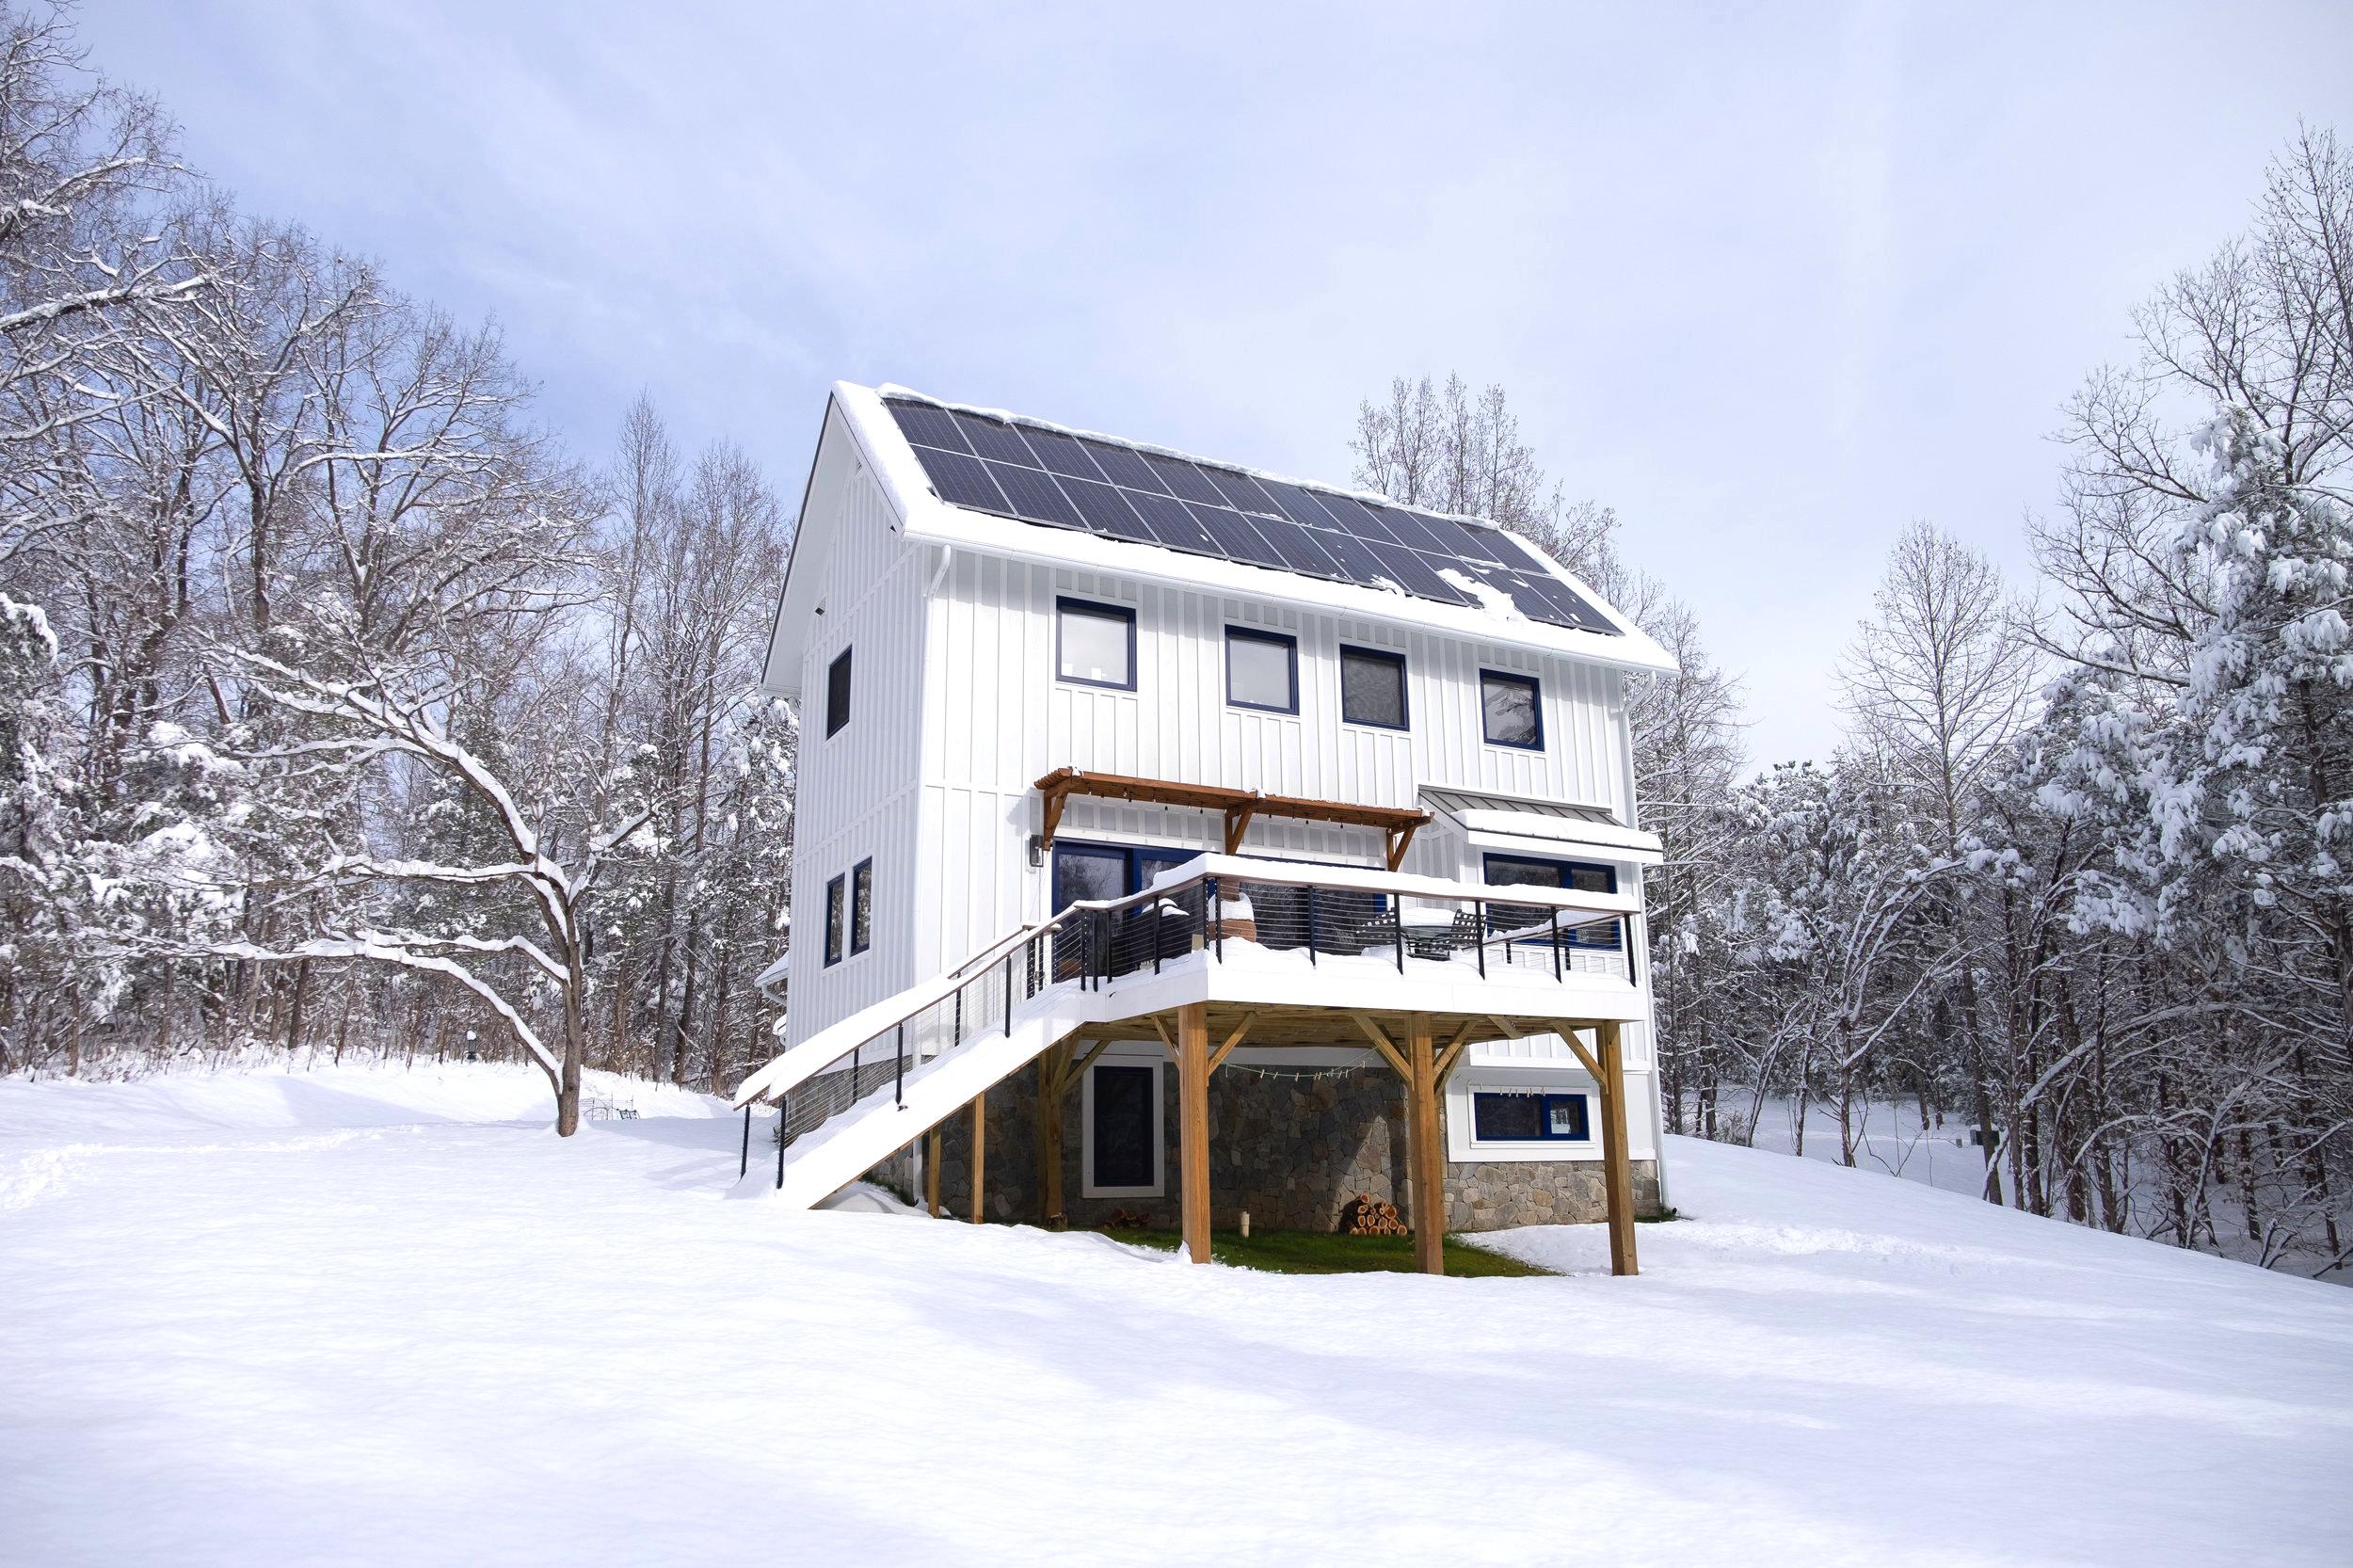 Franks Residence - South Elevation